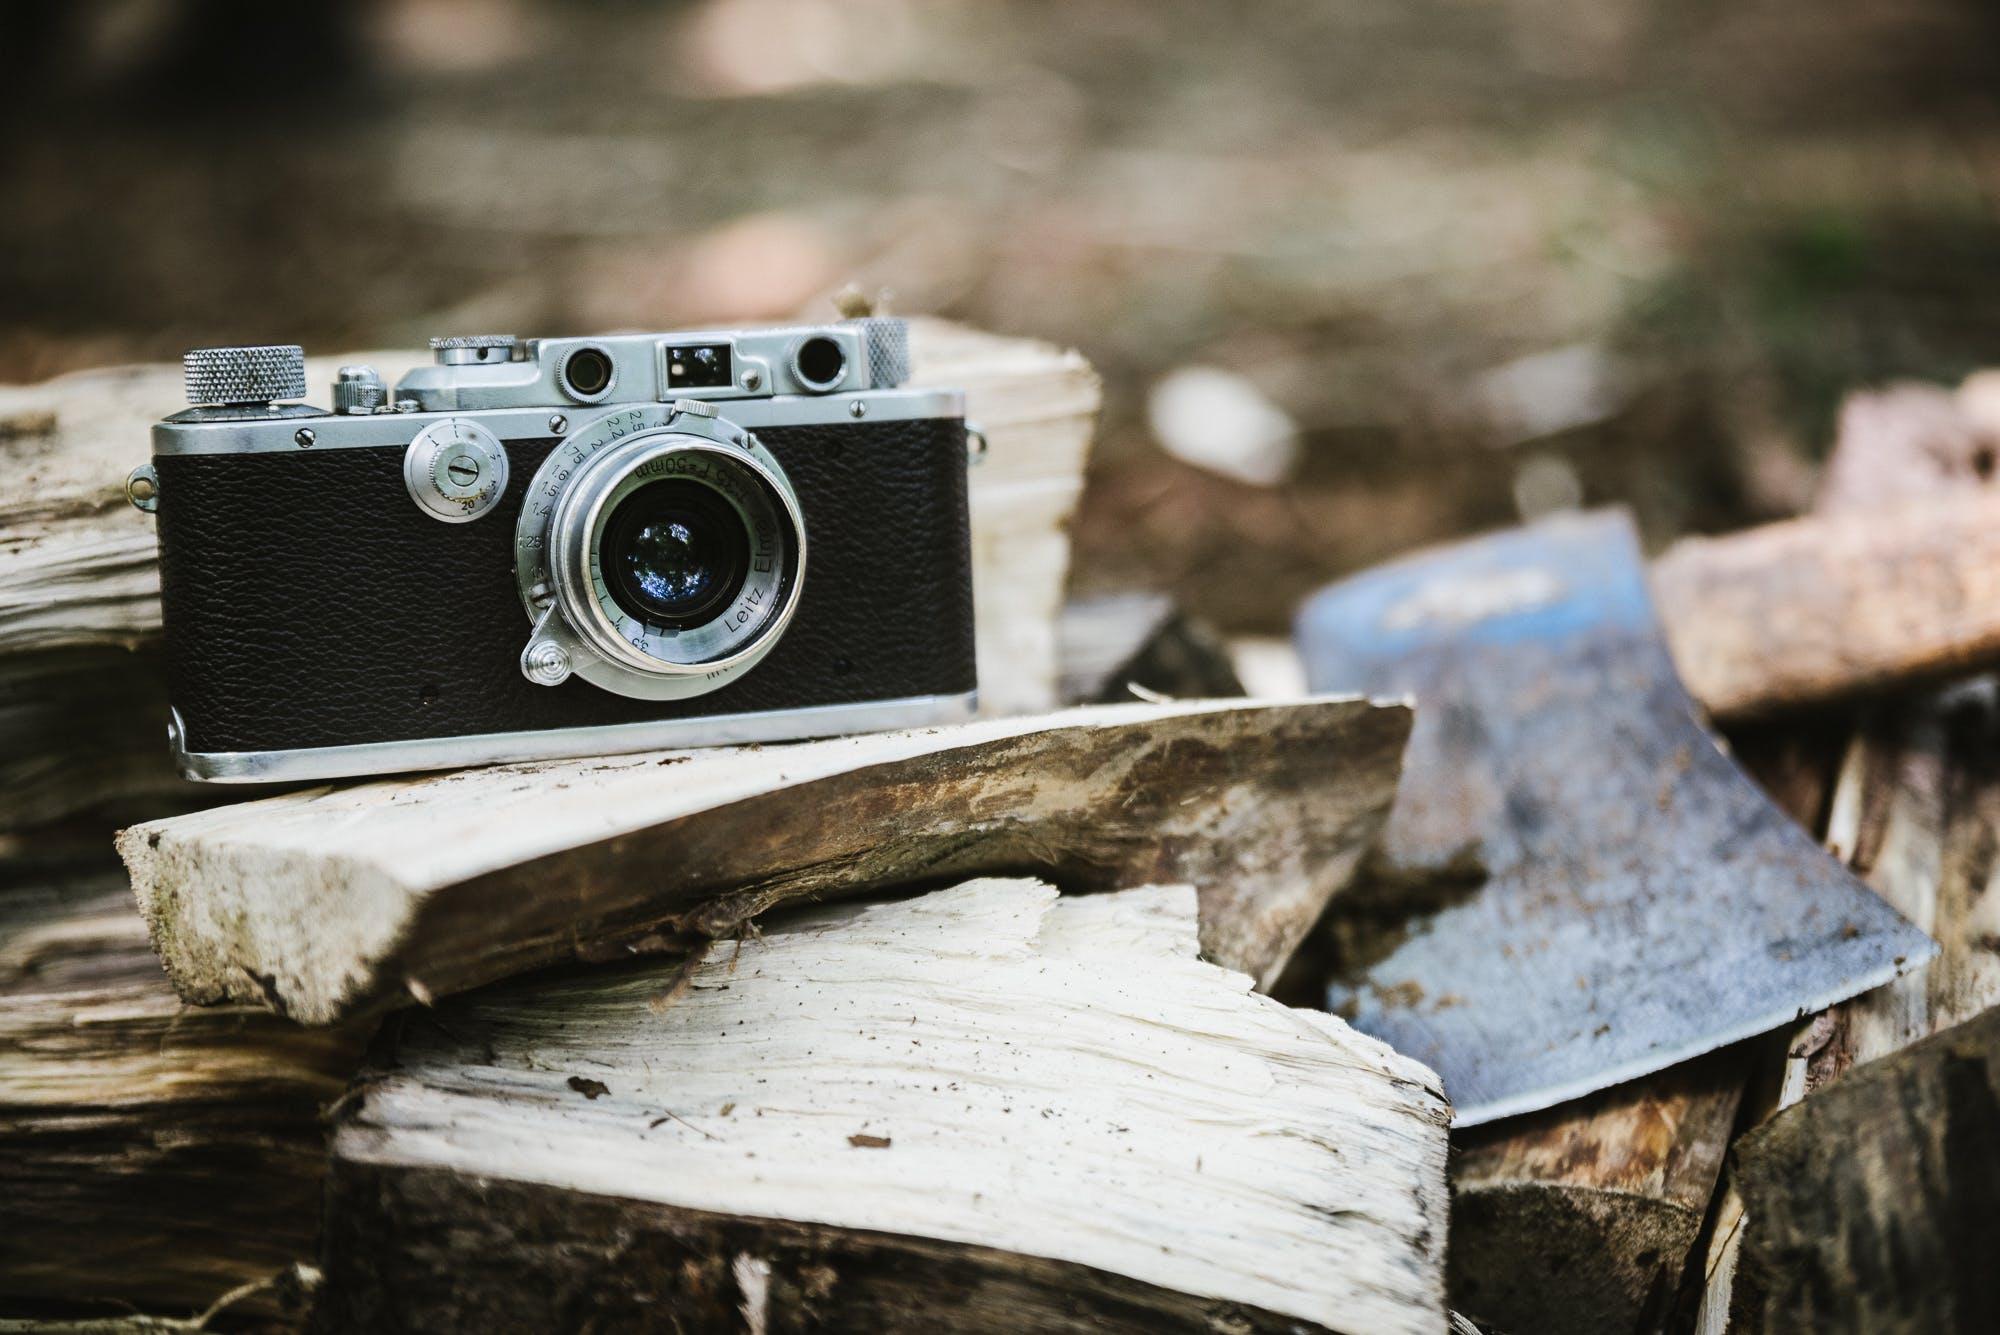 Black Bridge Camera on Wood Burner Beside Pickaxe